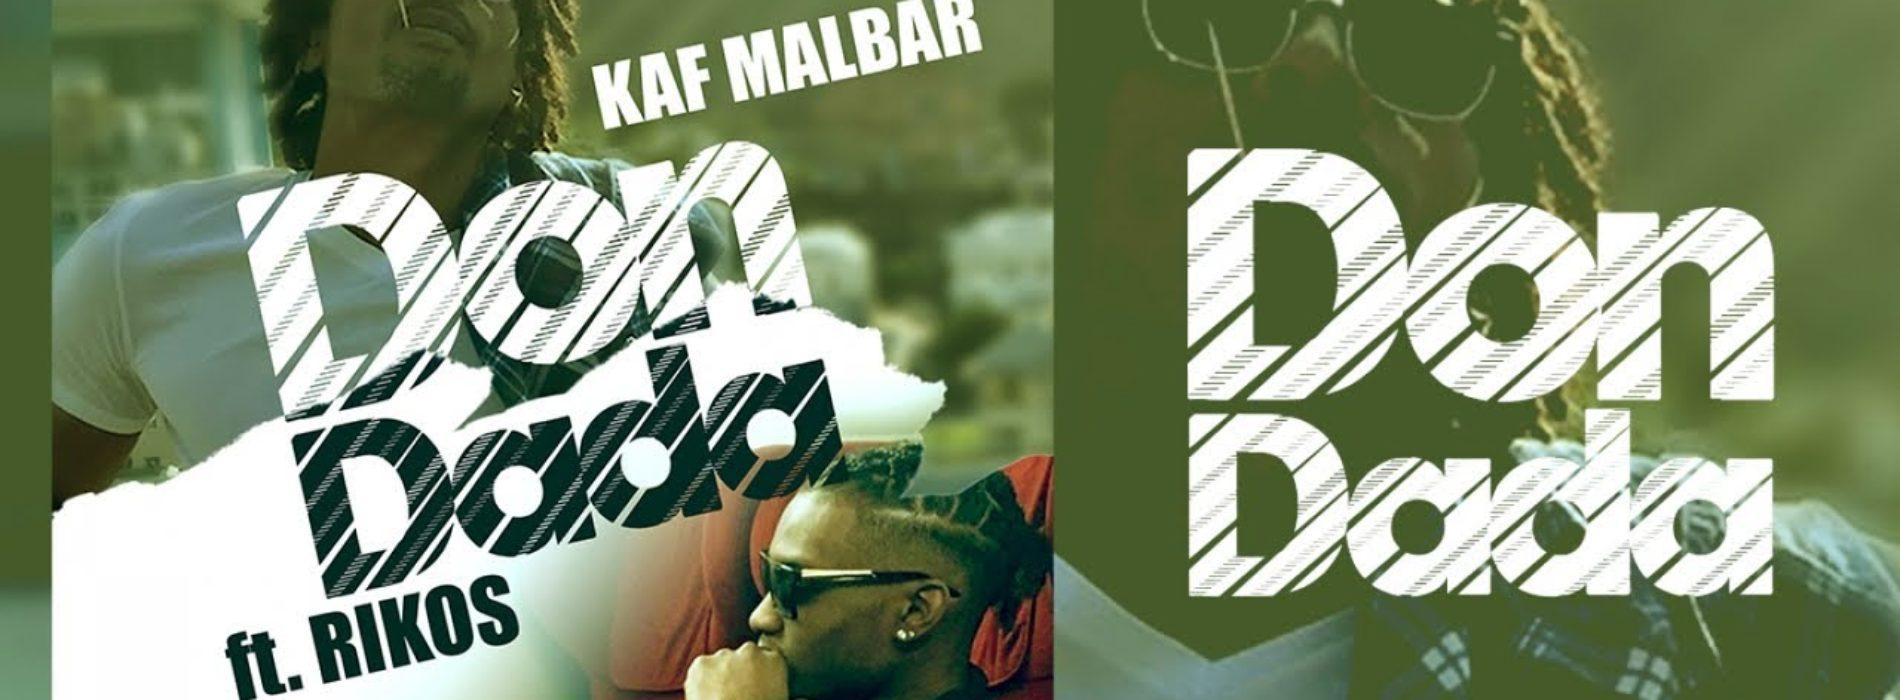 Kaf Malbar Ft. Rikos' – Don Dada – #AnFouPaMalStaya  – Septembre 2019